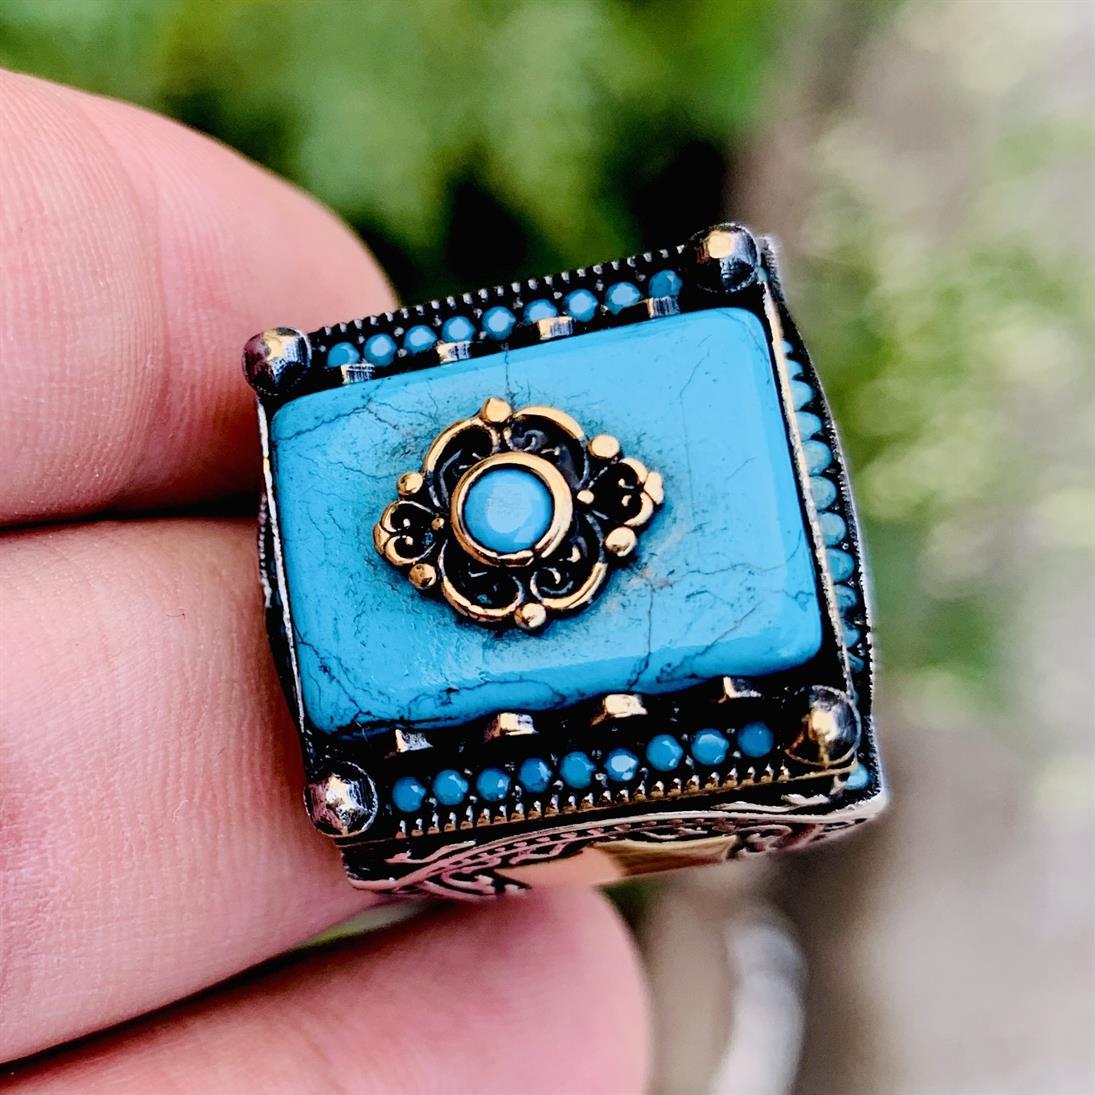 Turkish Rings Luxury 925 Silver 8 natural gemstones pakistan + 925 silver jewelry online